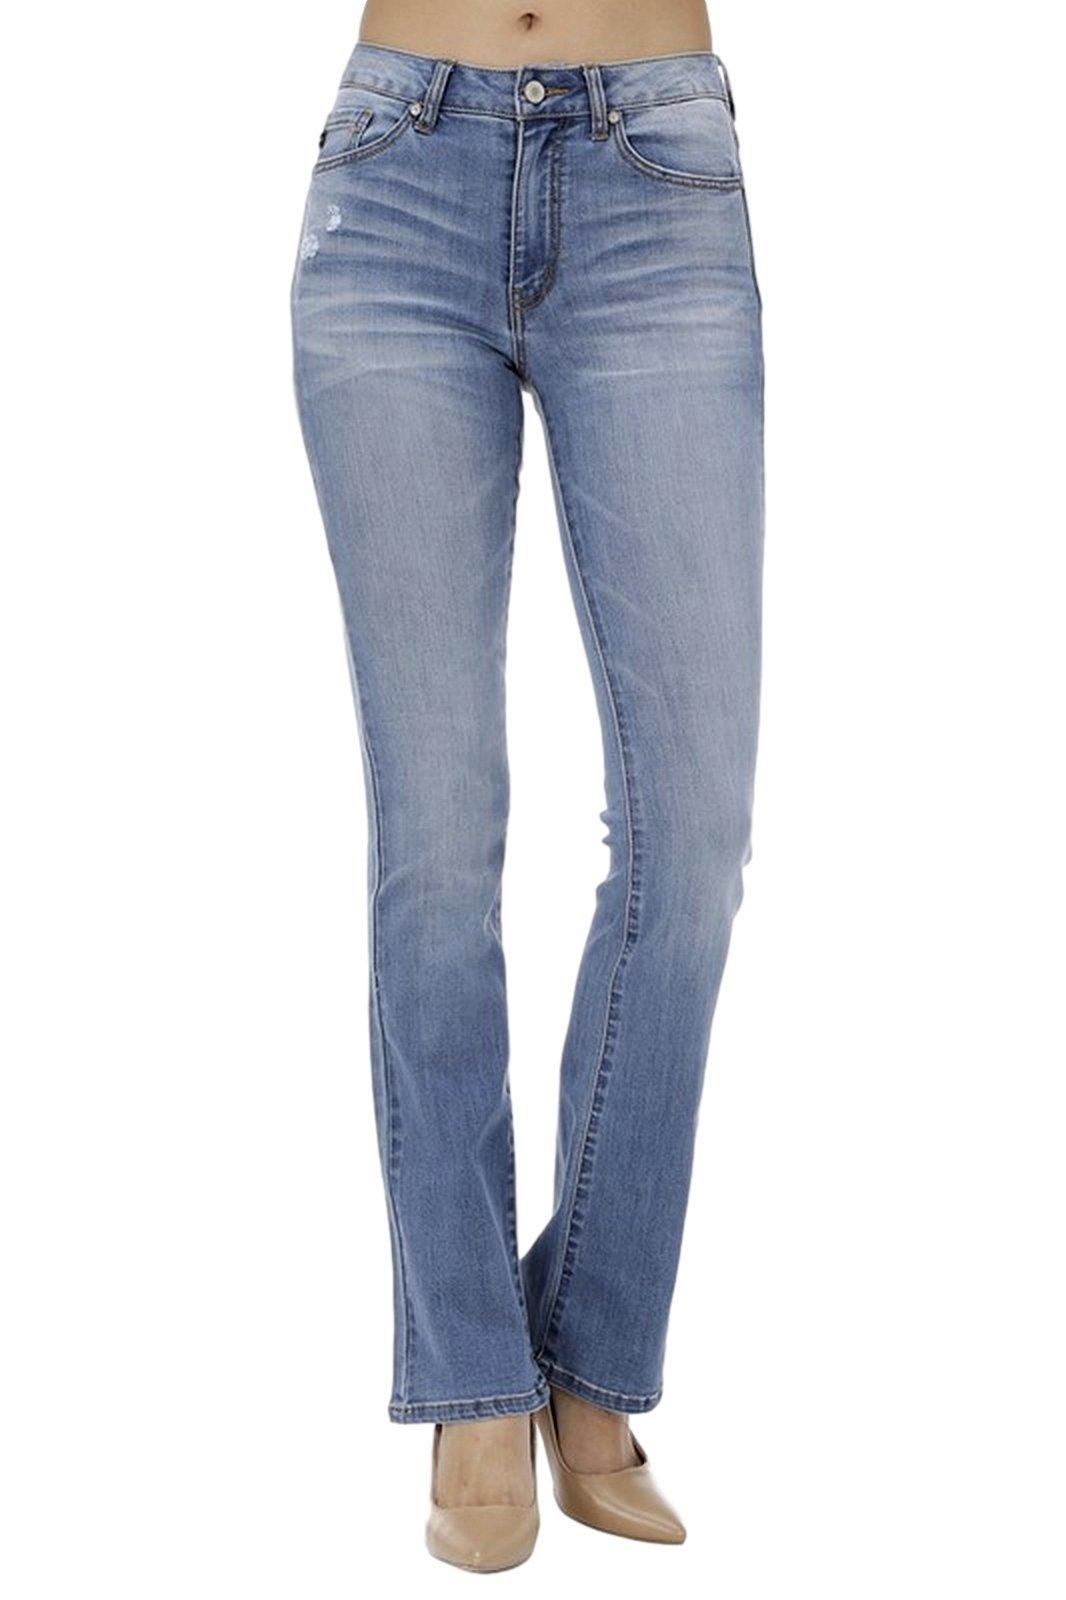 78708f3ca08d6 KAN CAN Women's High Rise Bootcut Jeans KC7111 - Denim Fit